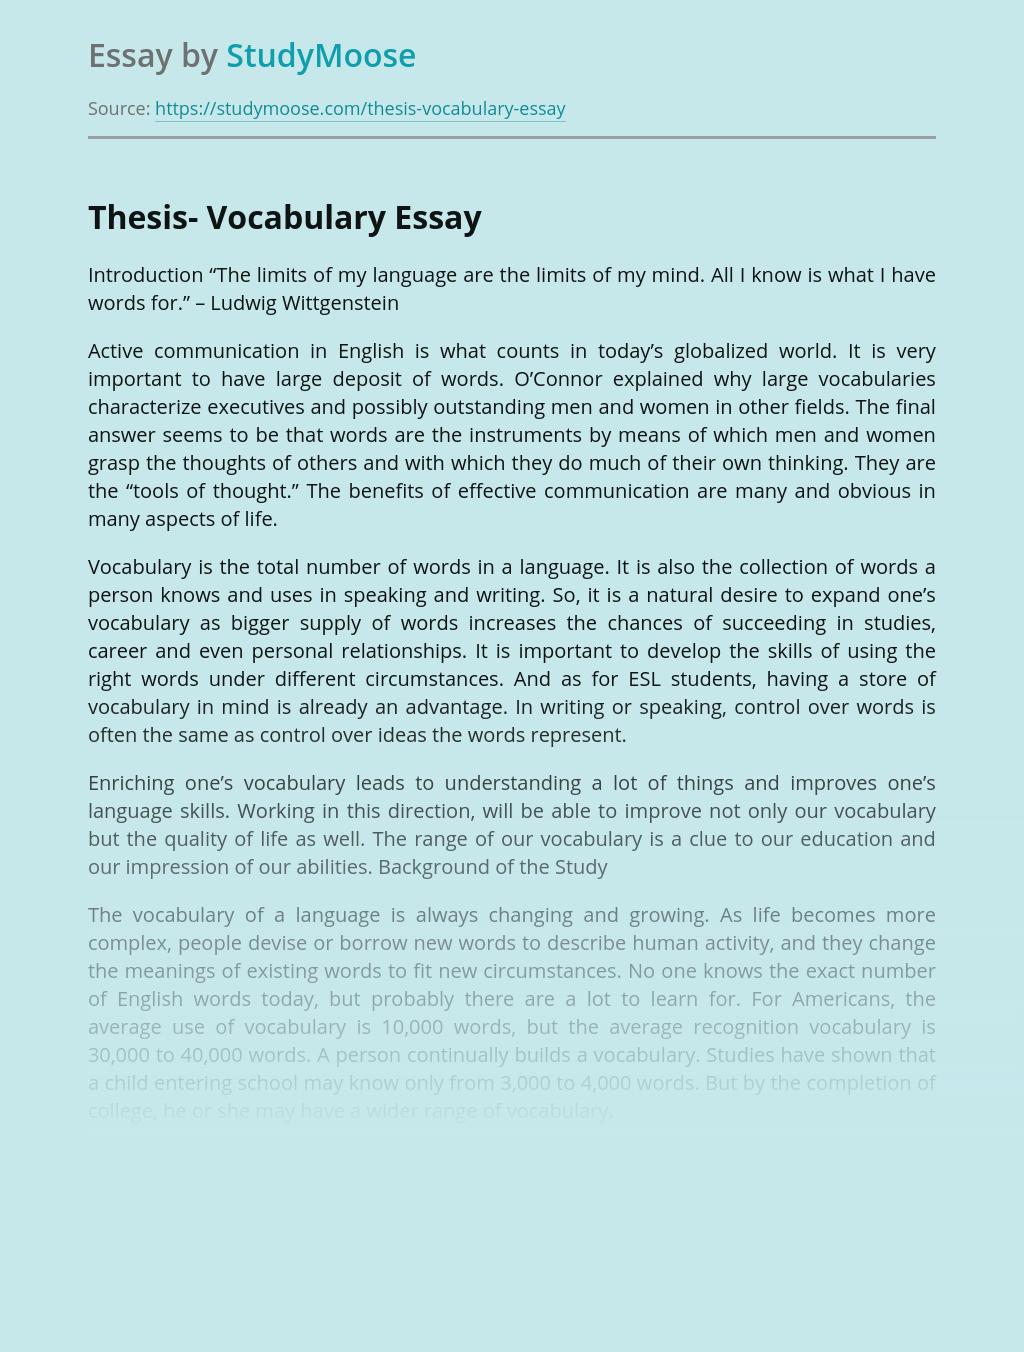 Thesis- Vocabulary